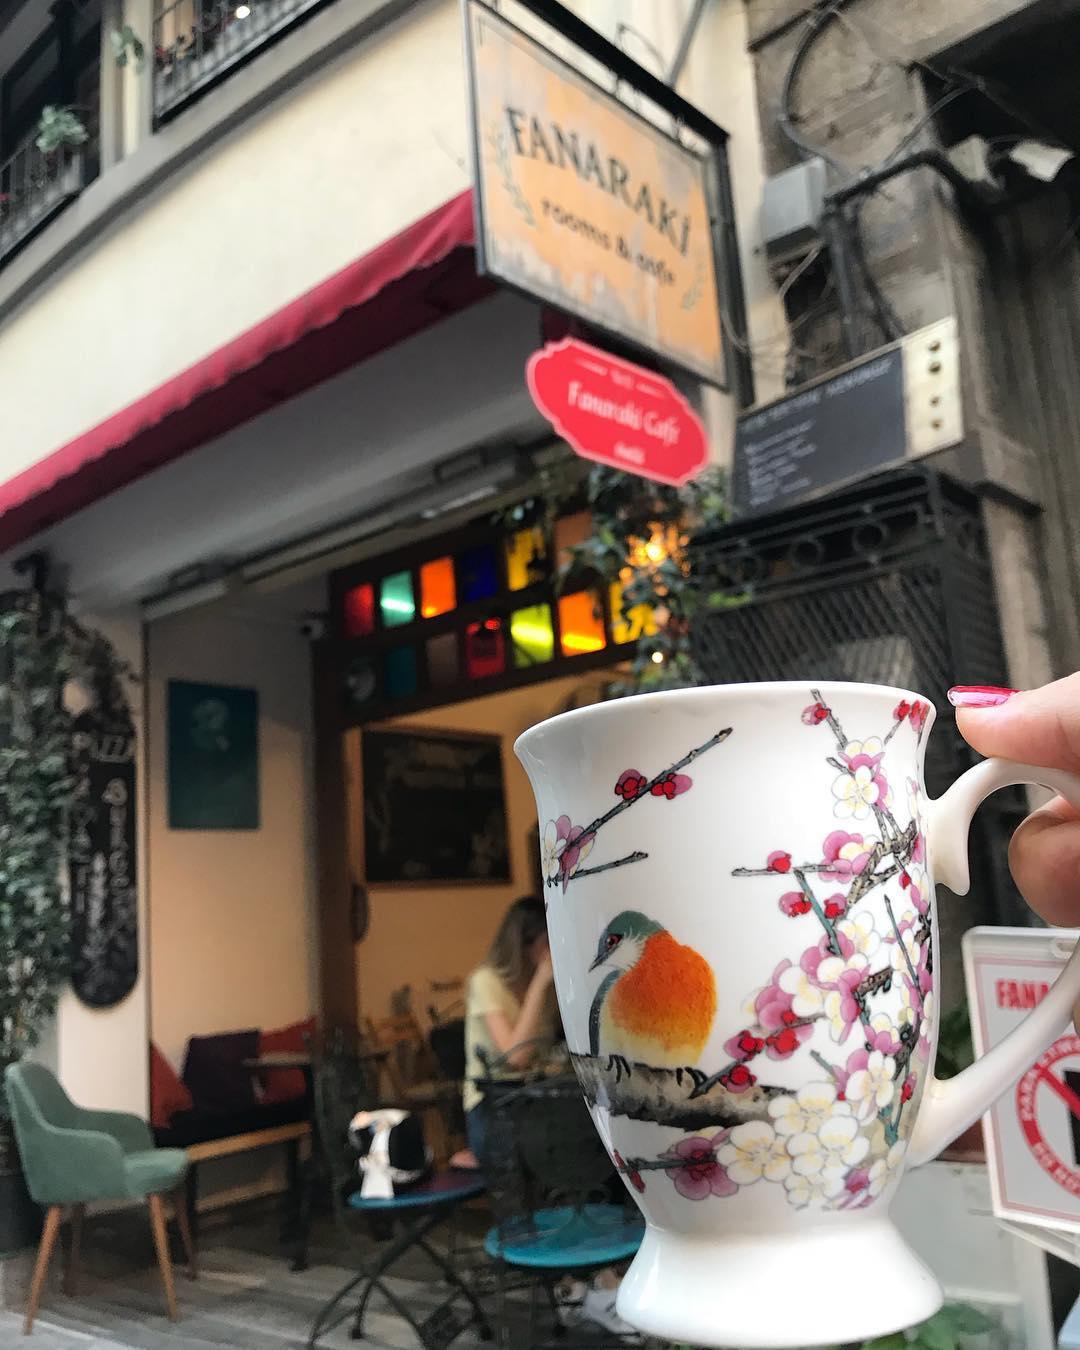 Fanaraki Cafe